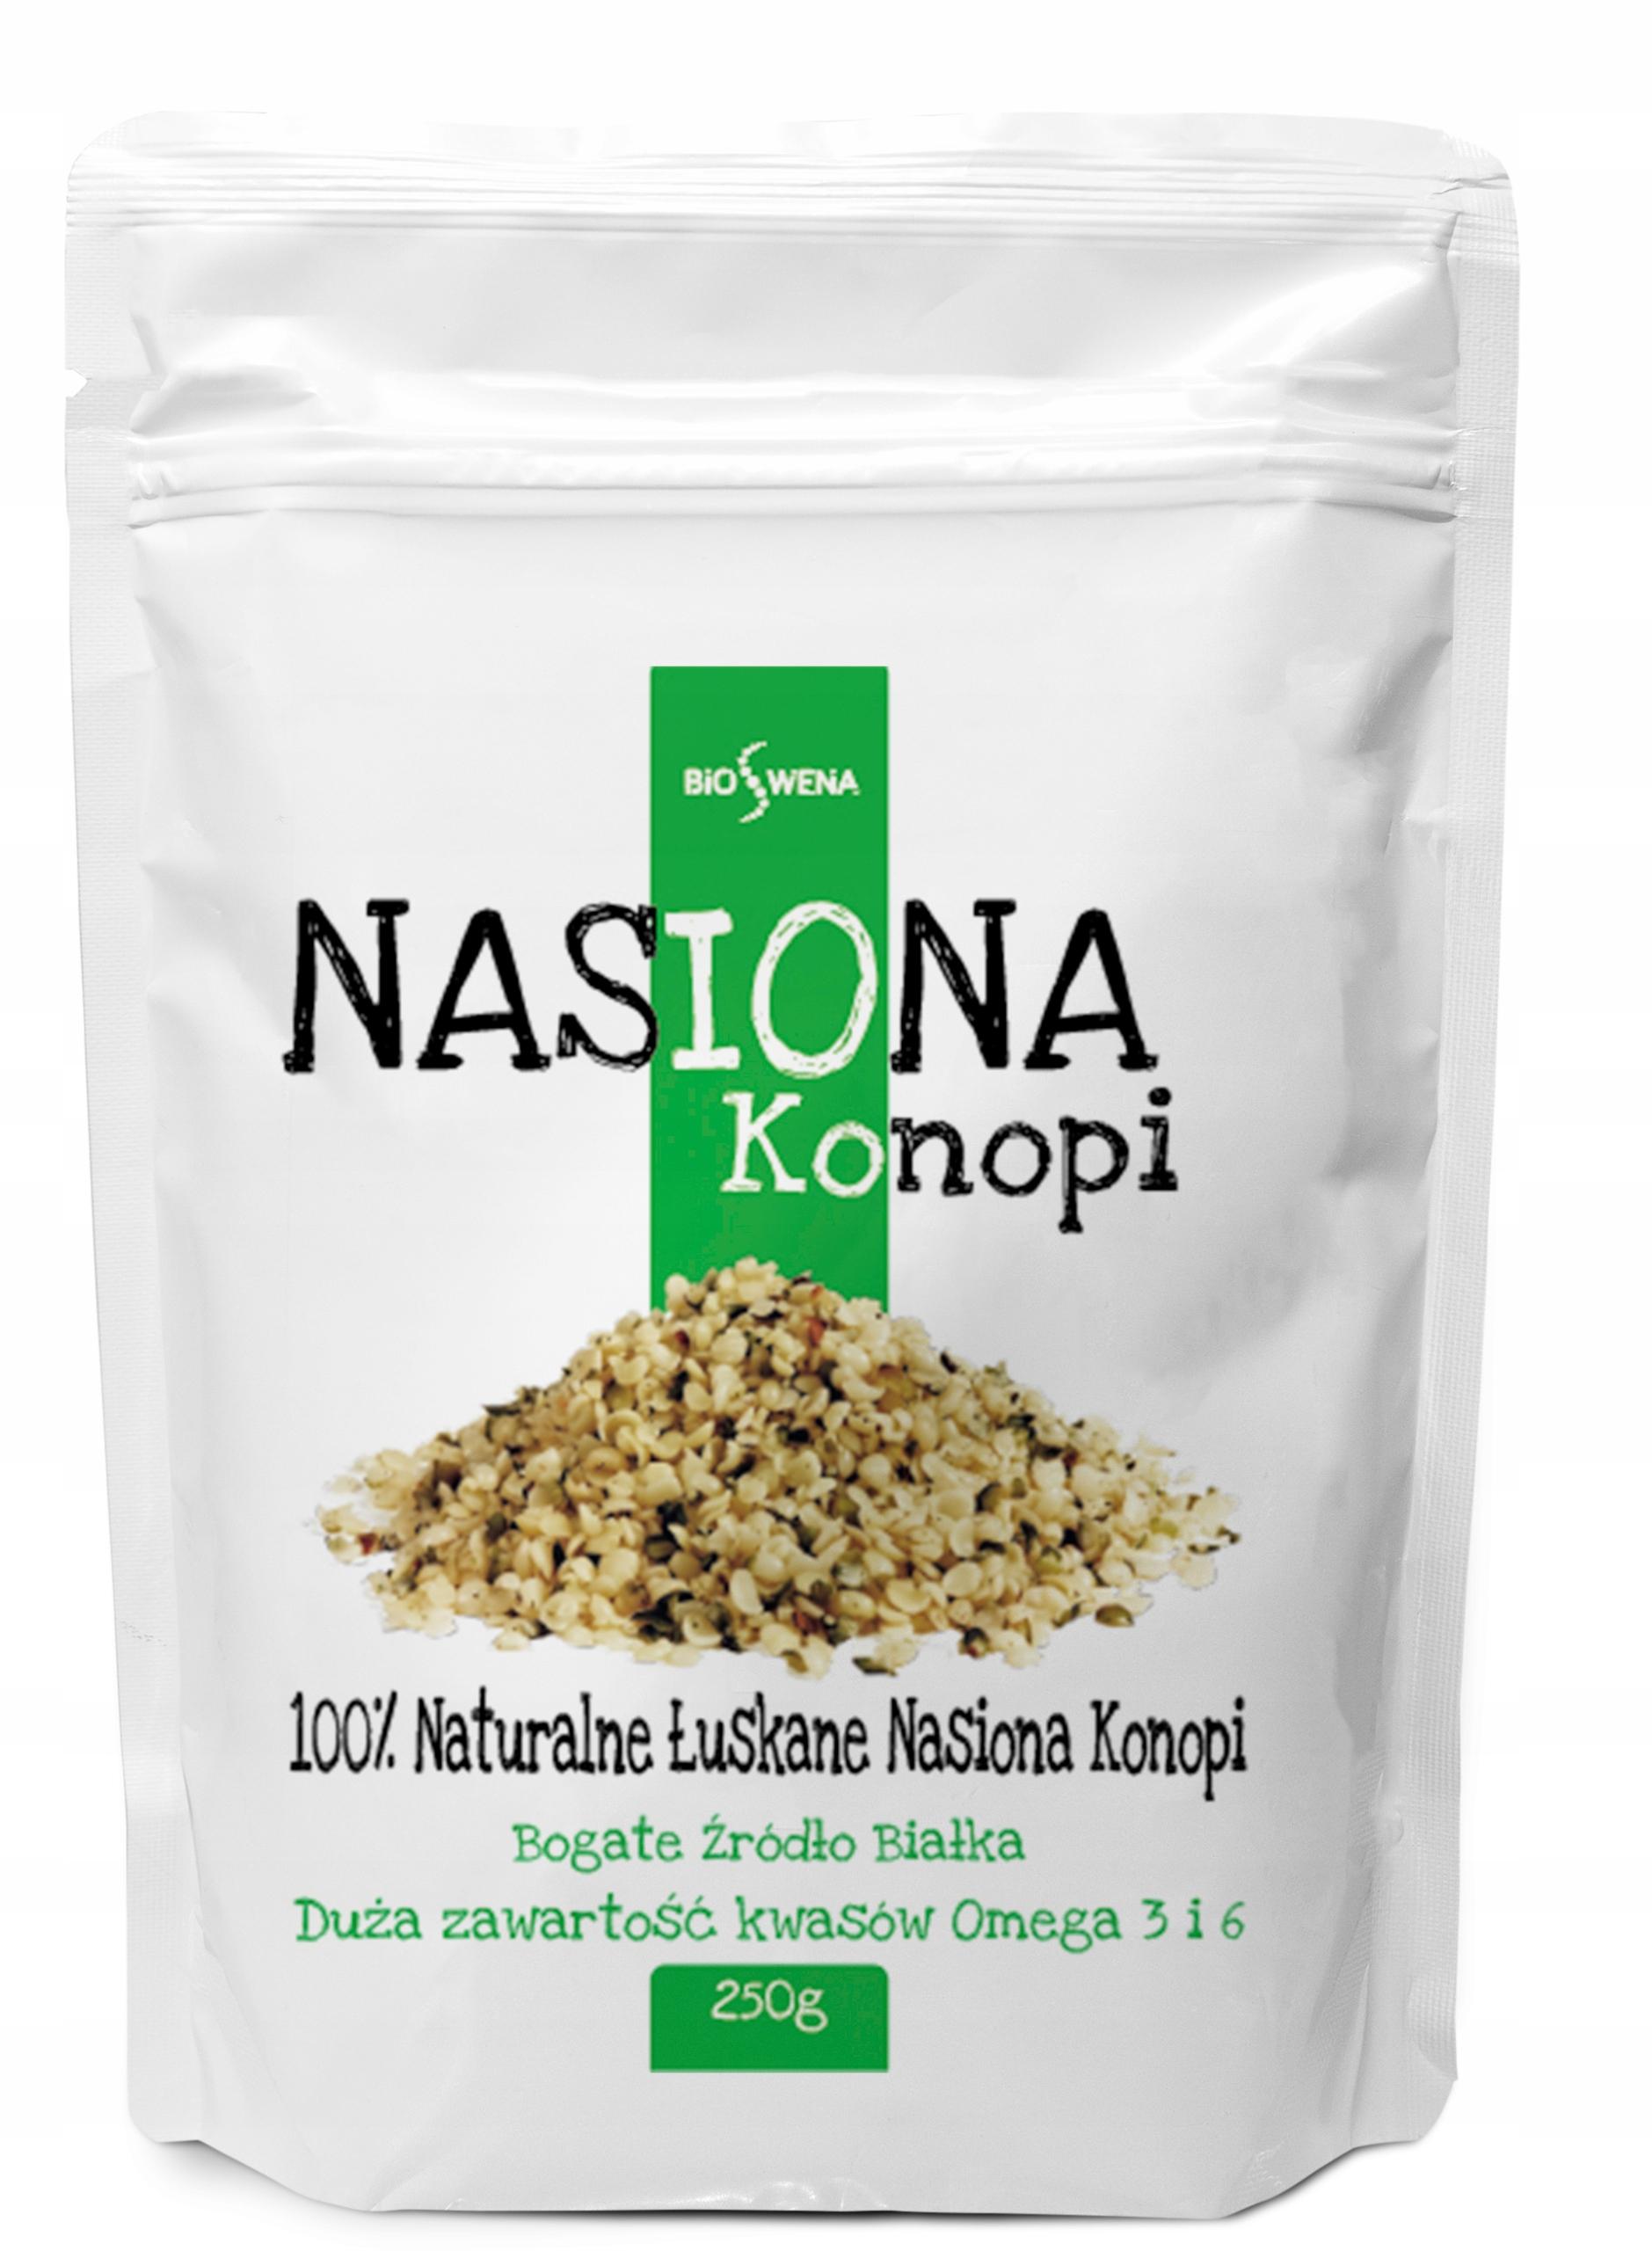 Семена конопли 250 г очищенные, протеин / BIOSWENA